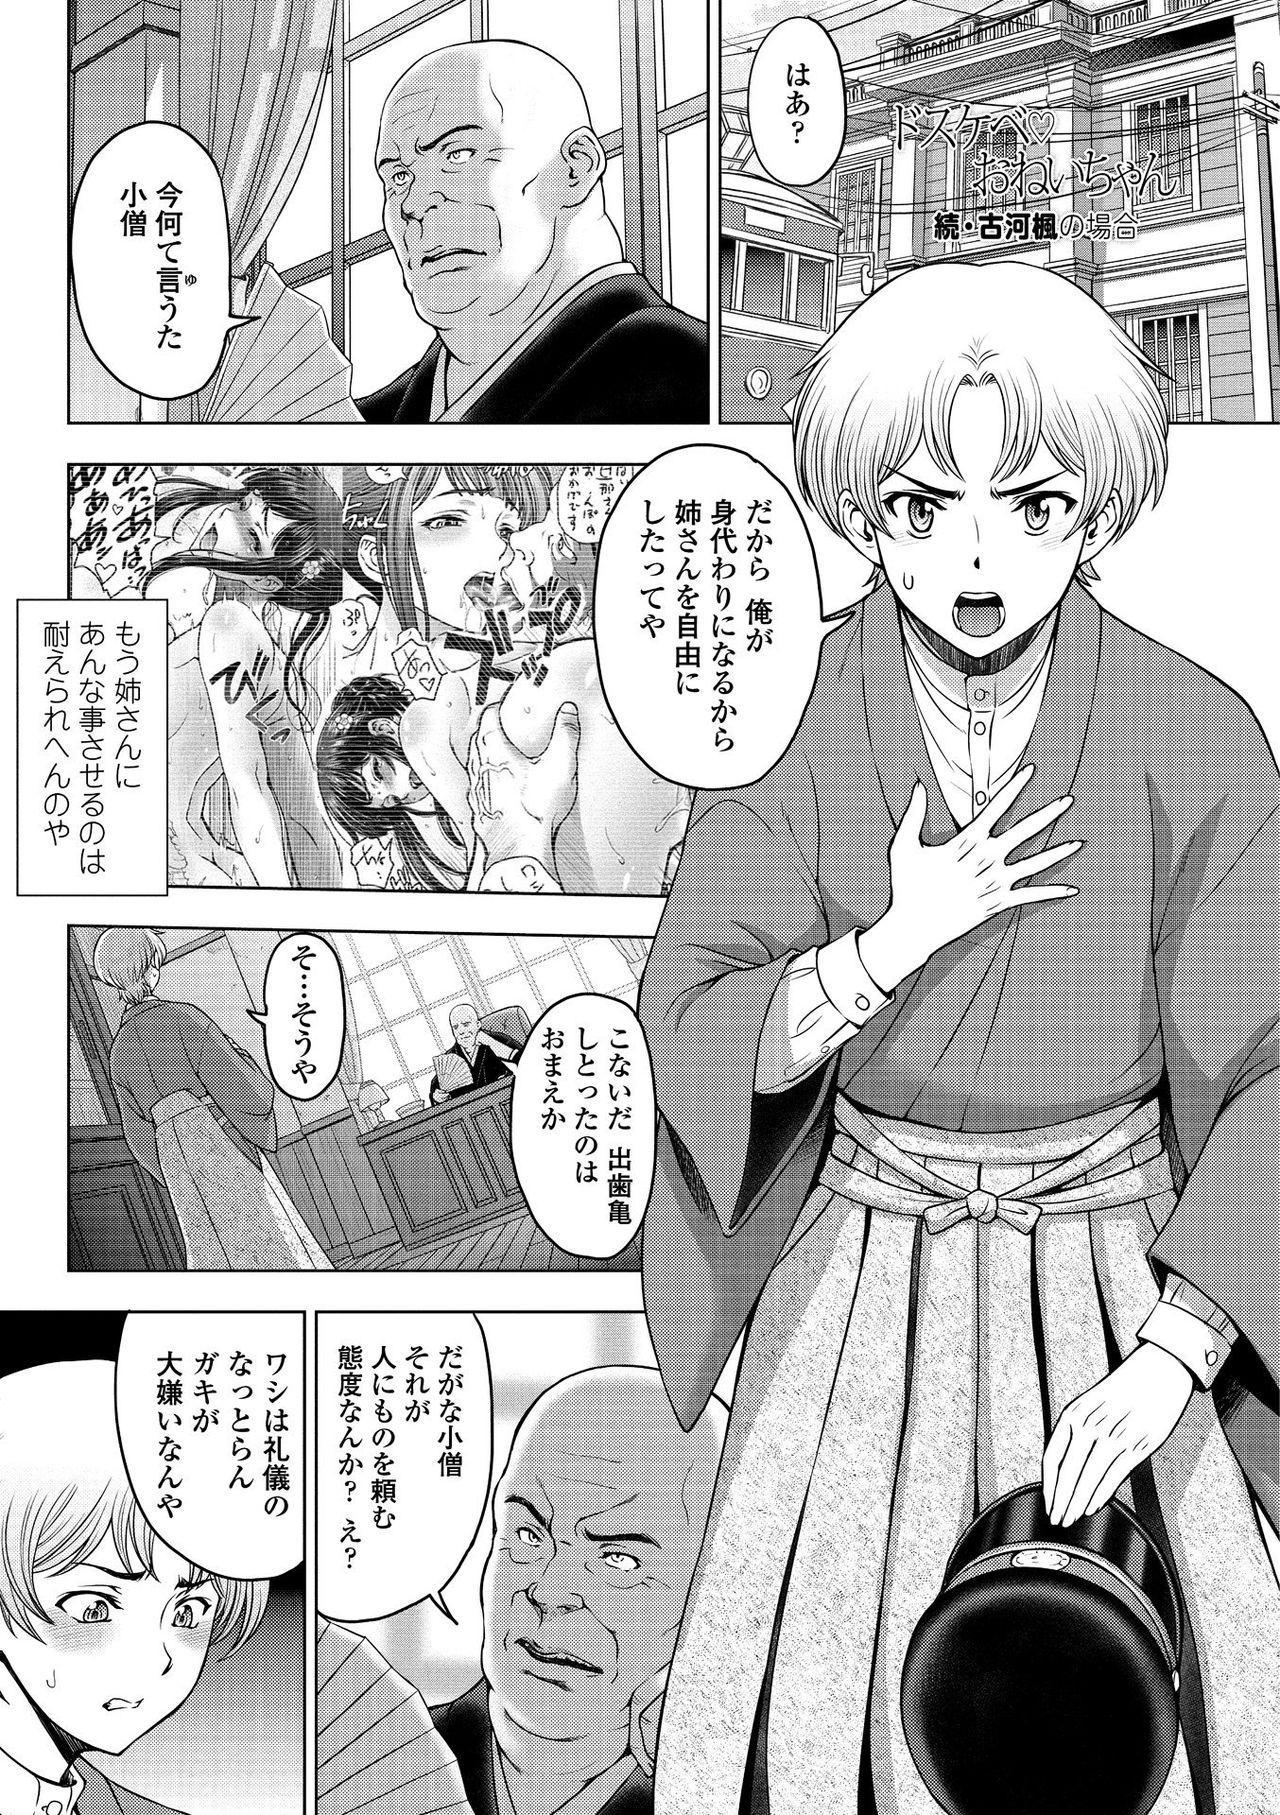 Dosukebe Onei-chan 146